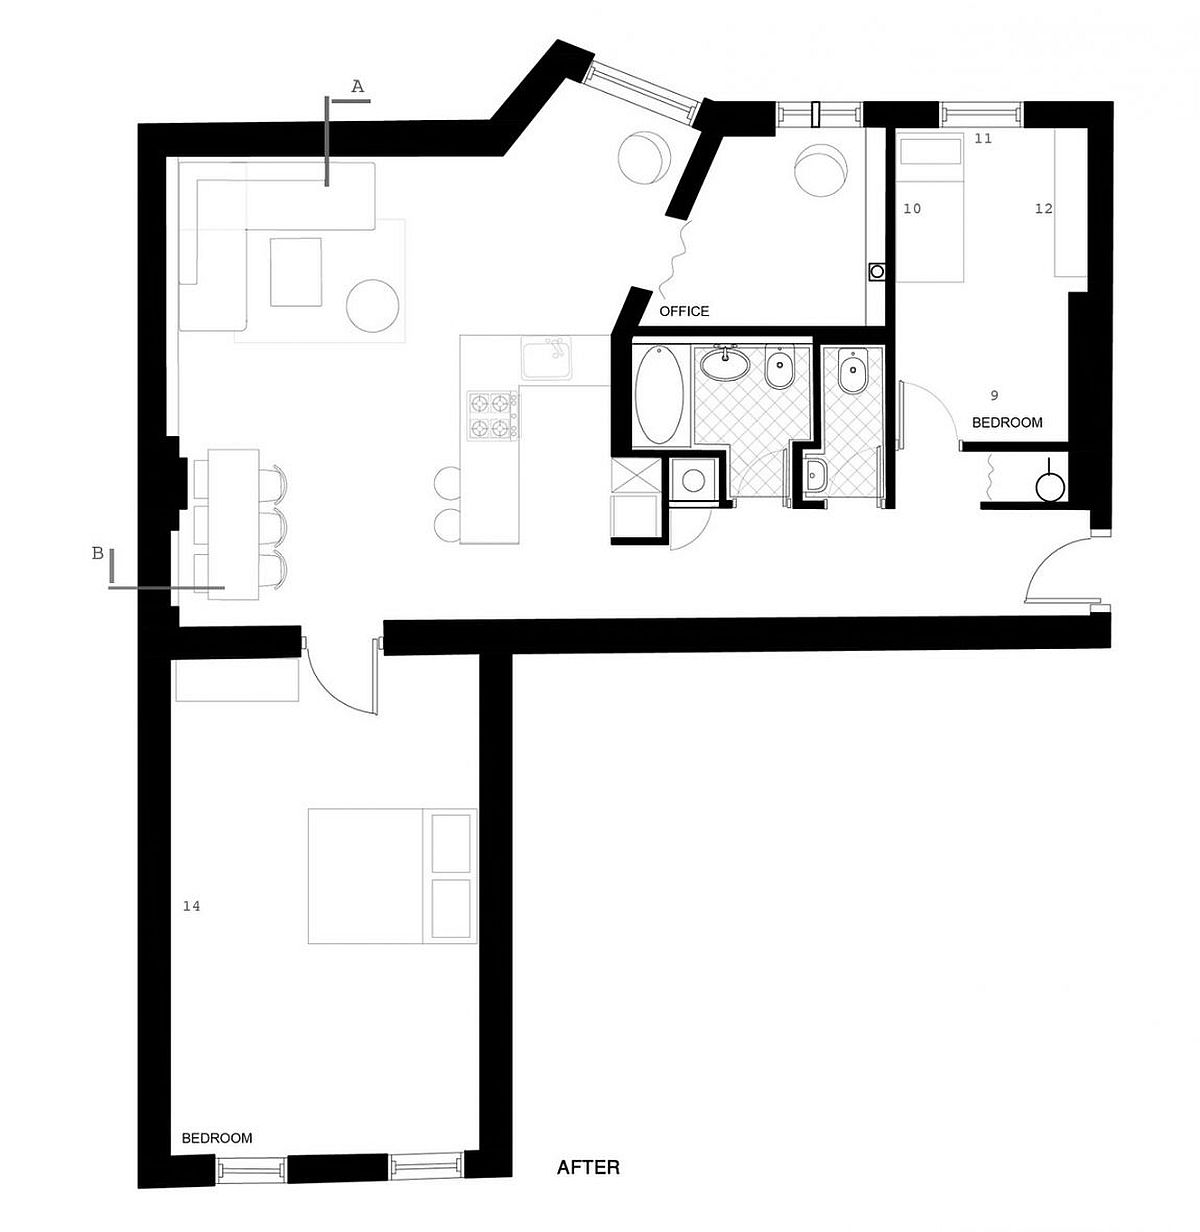 Floor plan pf the Berlin house after renovation